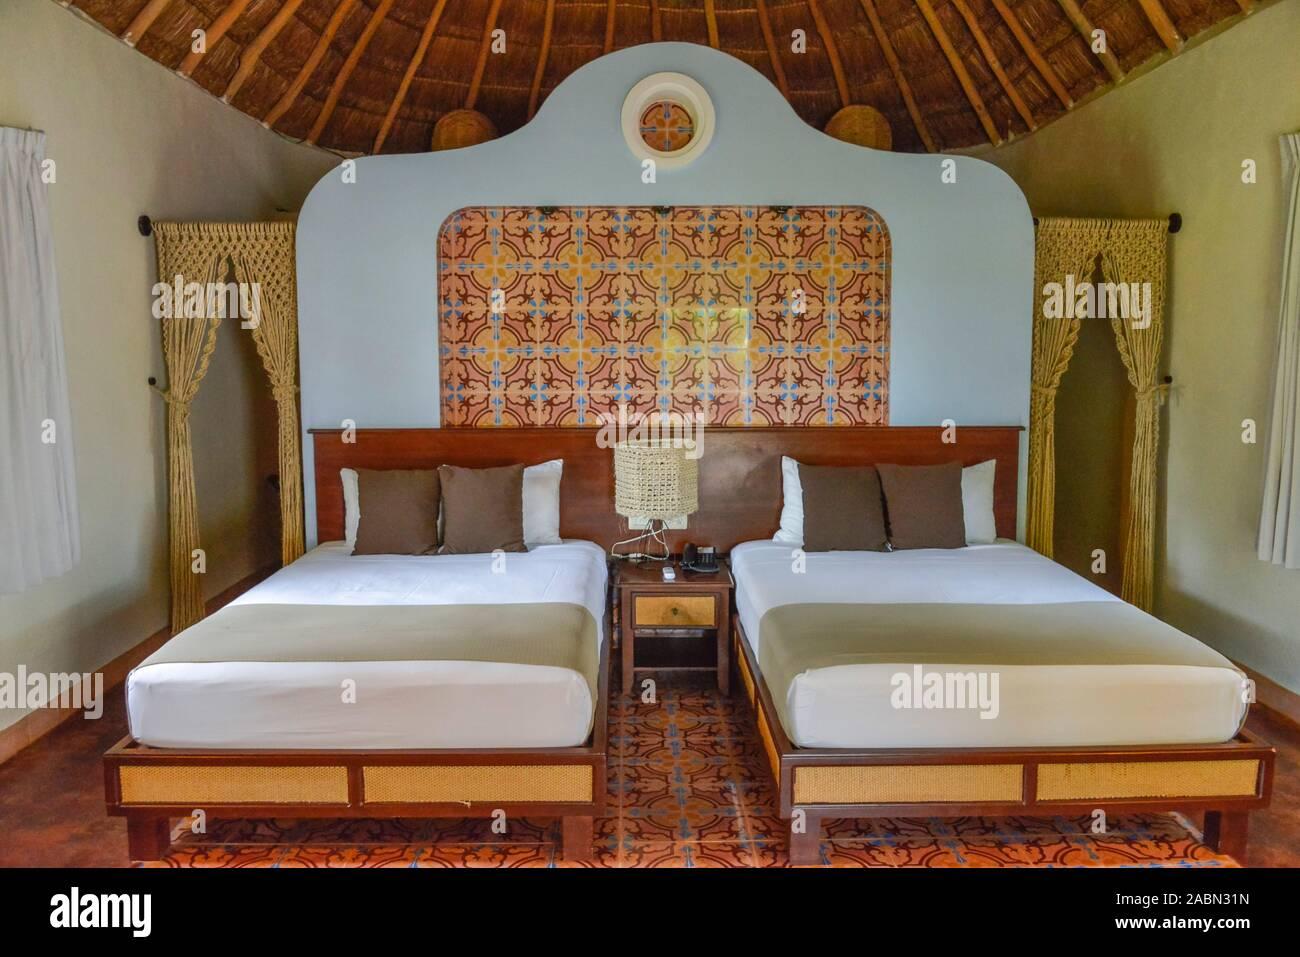 Bett, Ferienhaus, Bungalow, Hotelanlage, Hacienda Sotuta de Peon, Yucatan, Mexiko Stock Photo